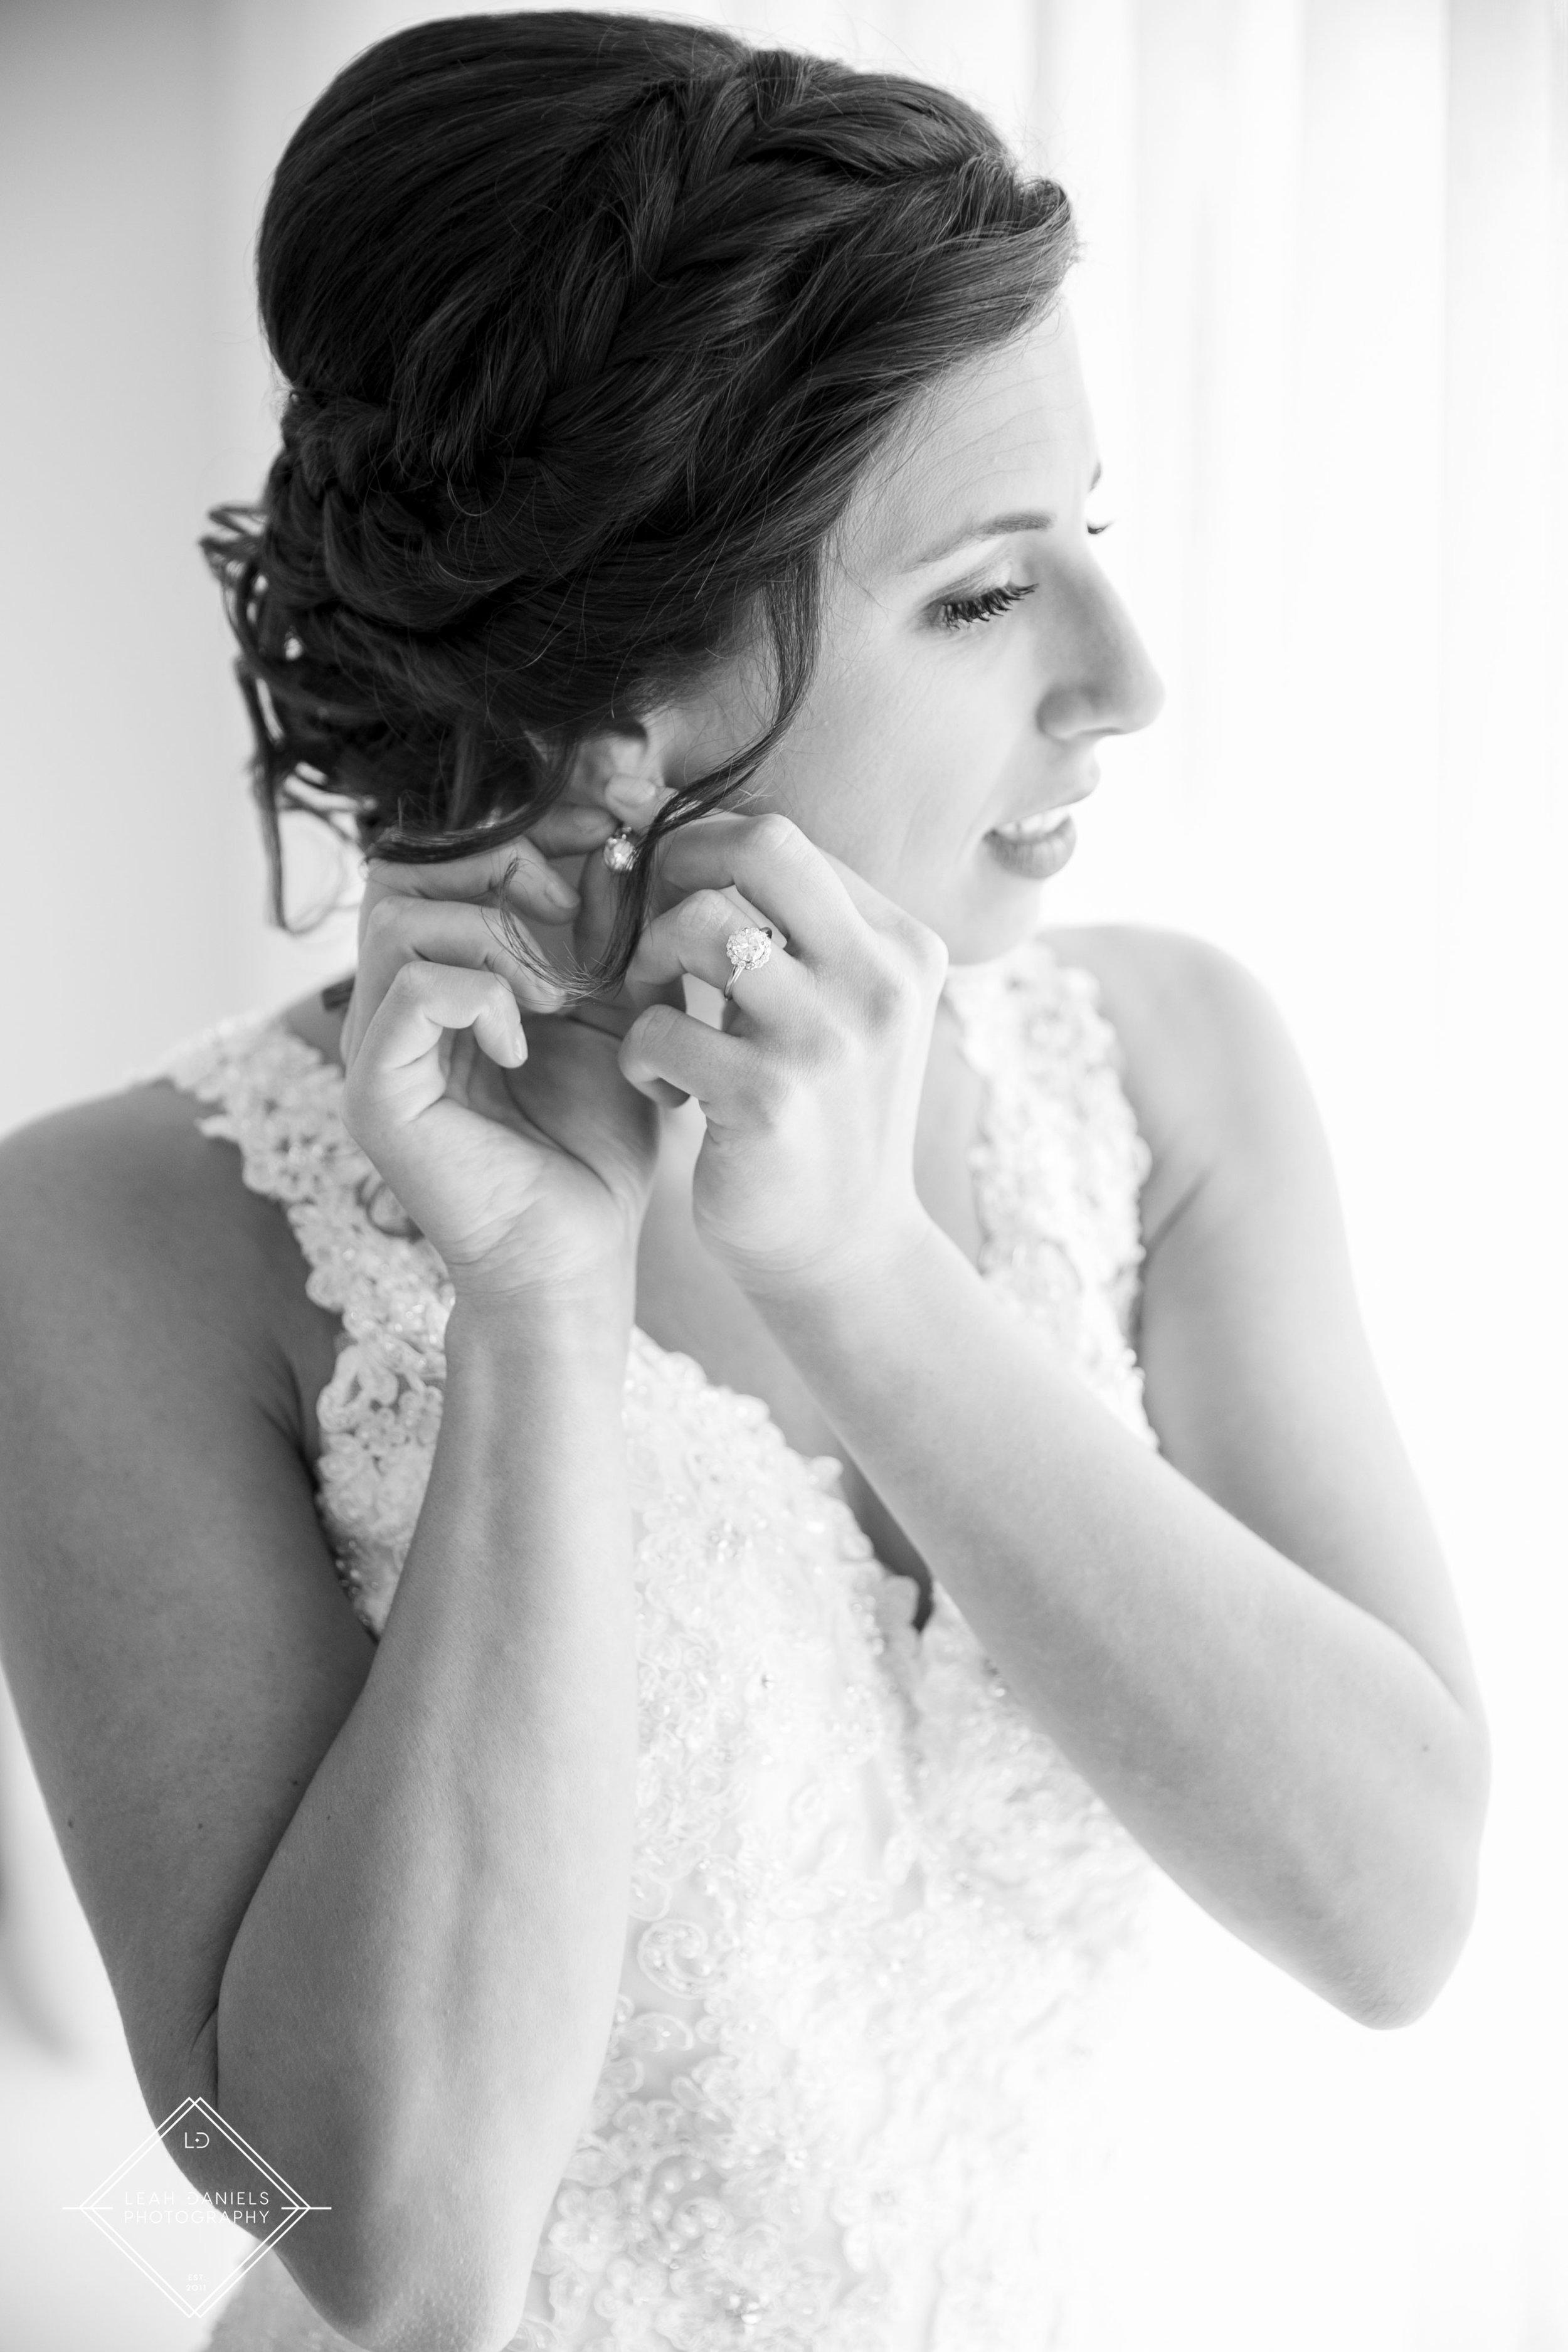 NOW Larimar Destination Wedding Photos; The Bride